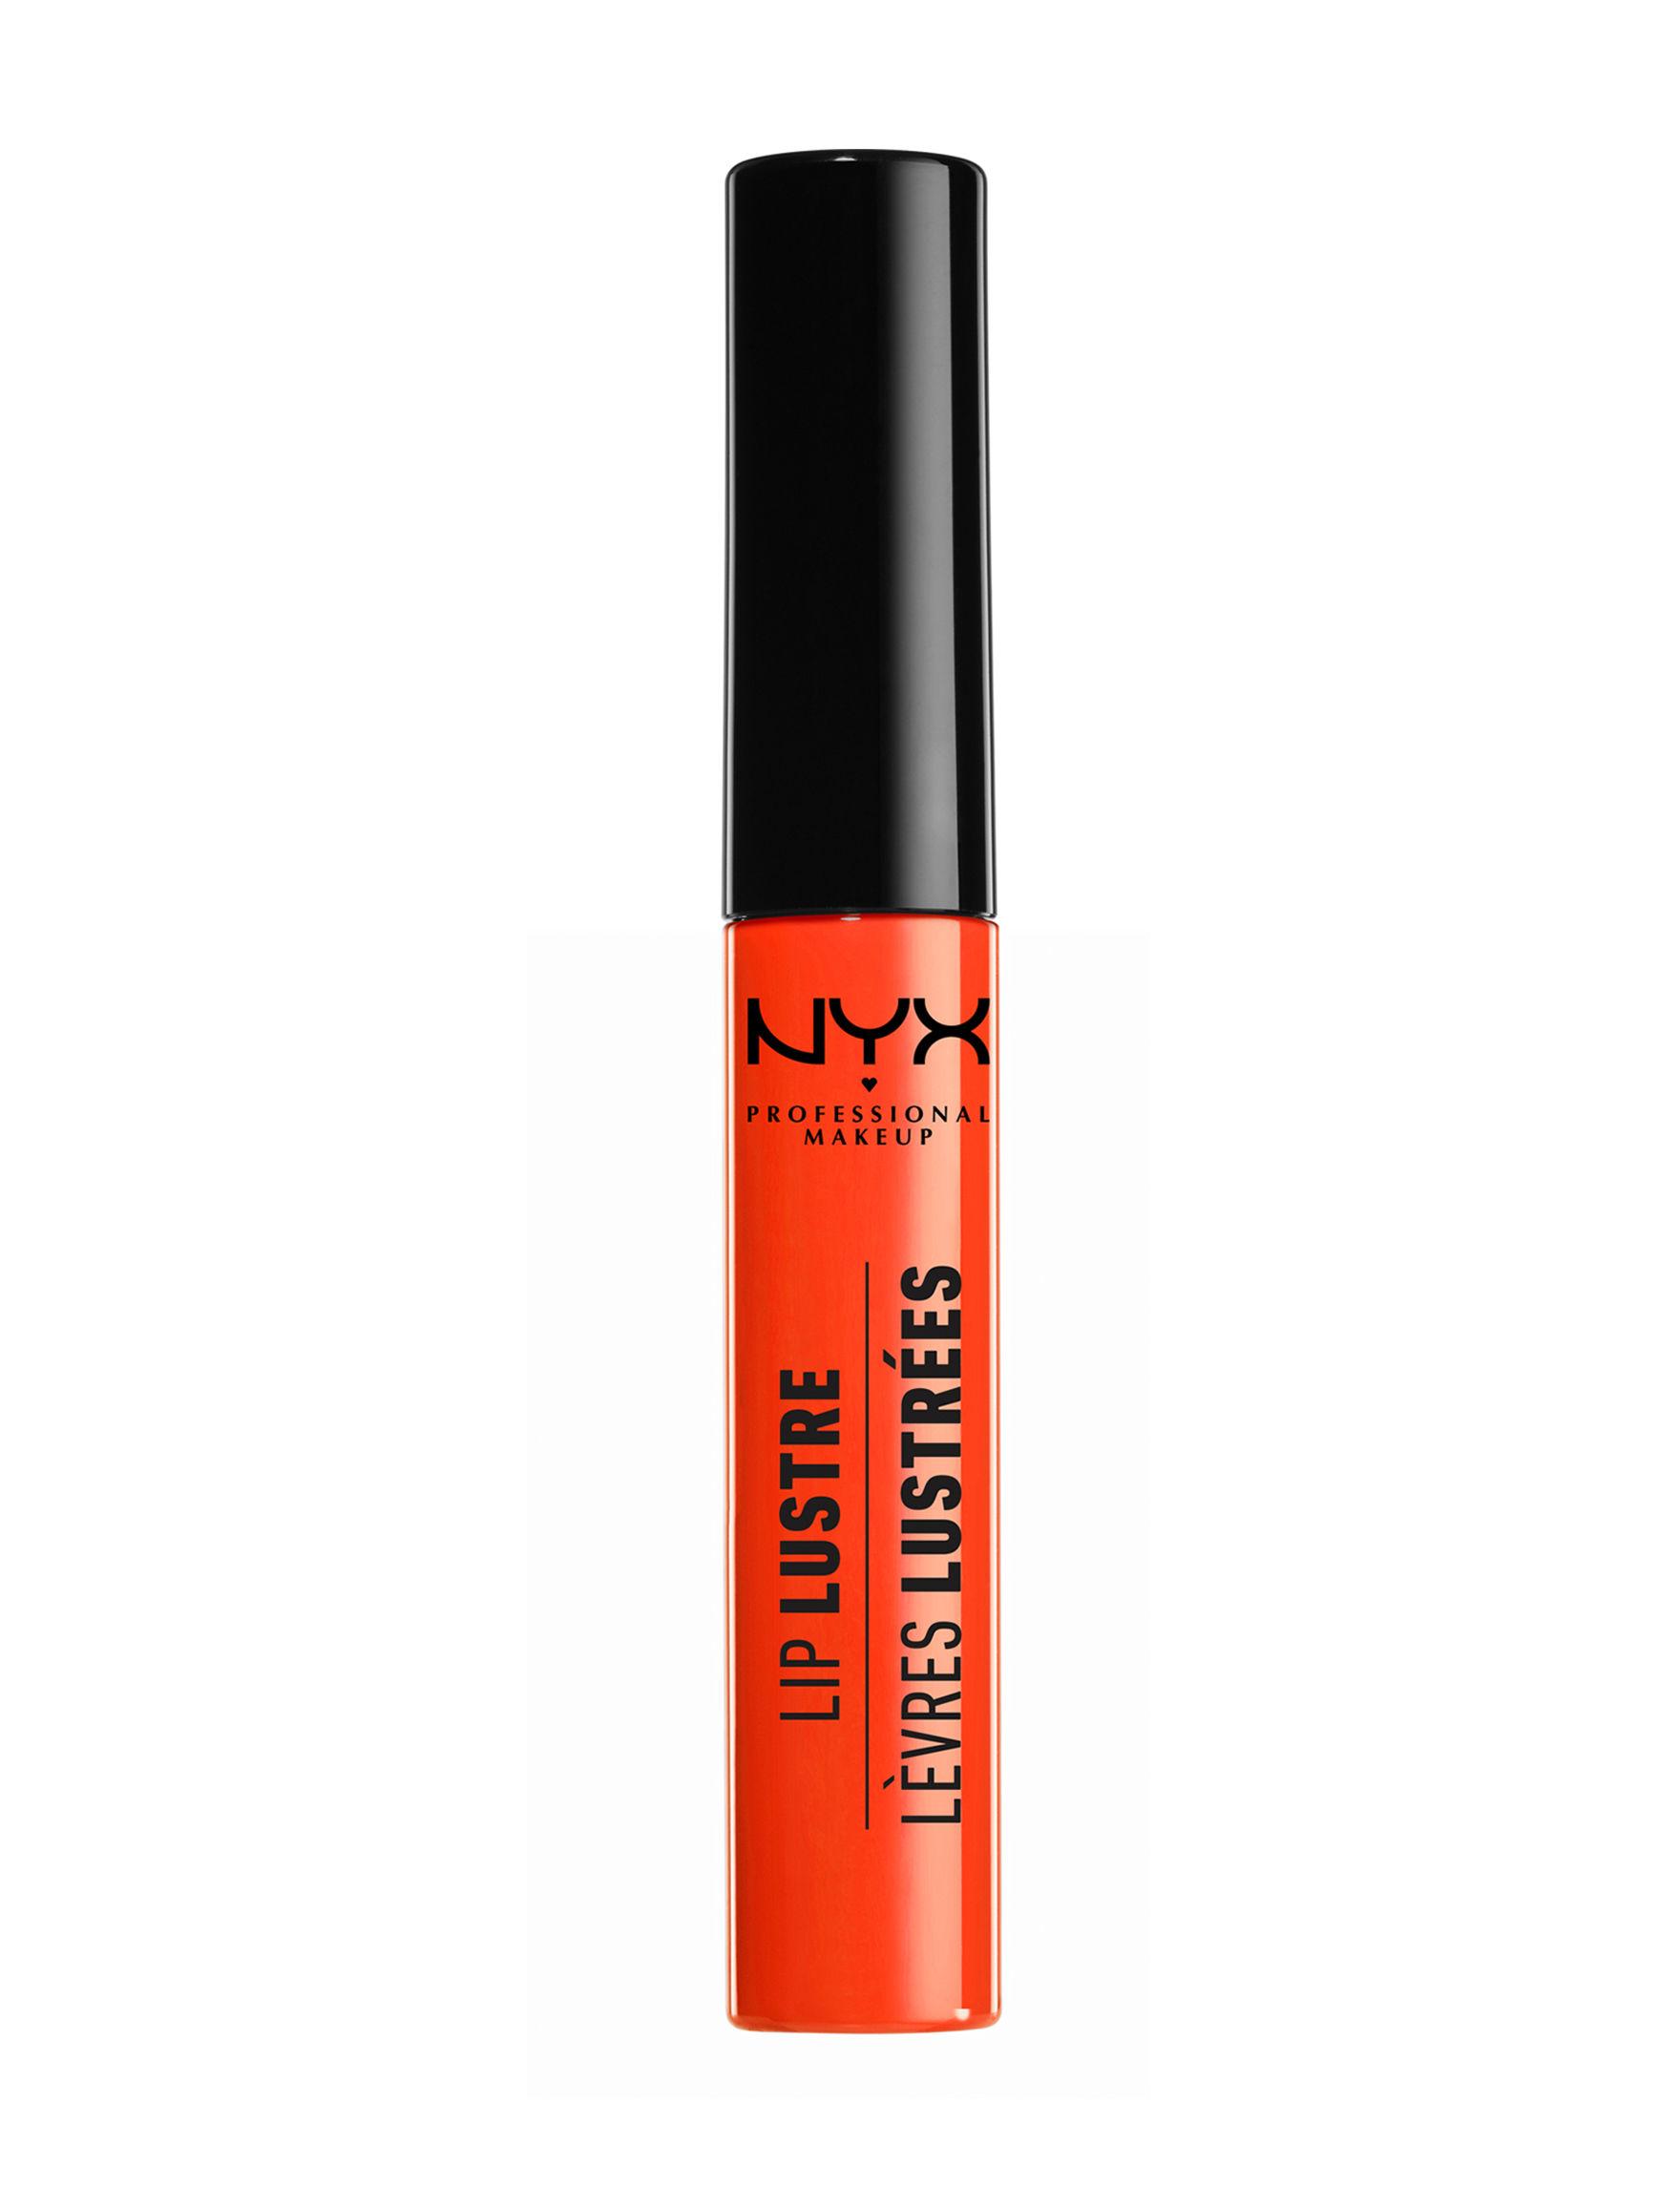 NYX Professional Makeup Juicy Peach Lips Lip Gloss